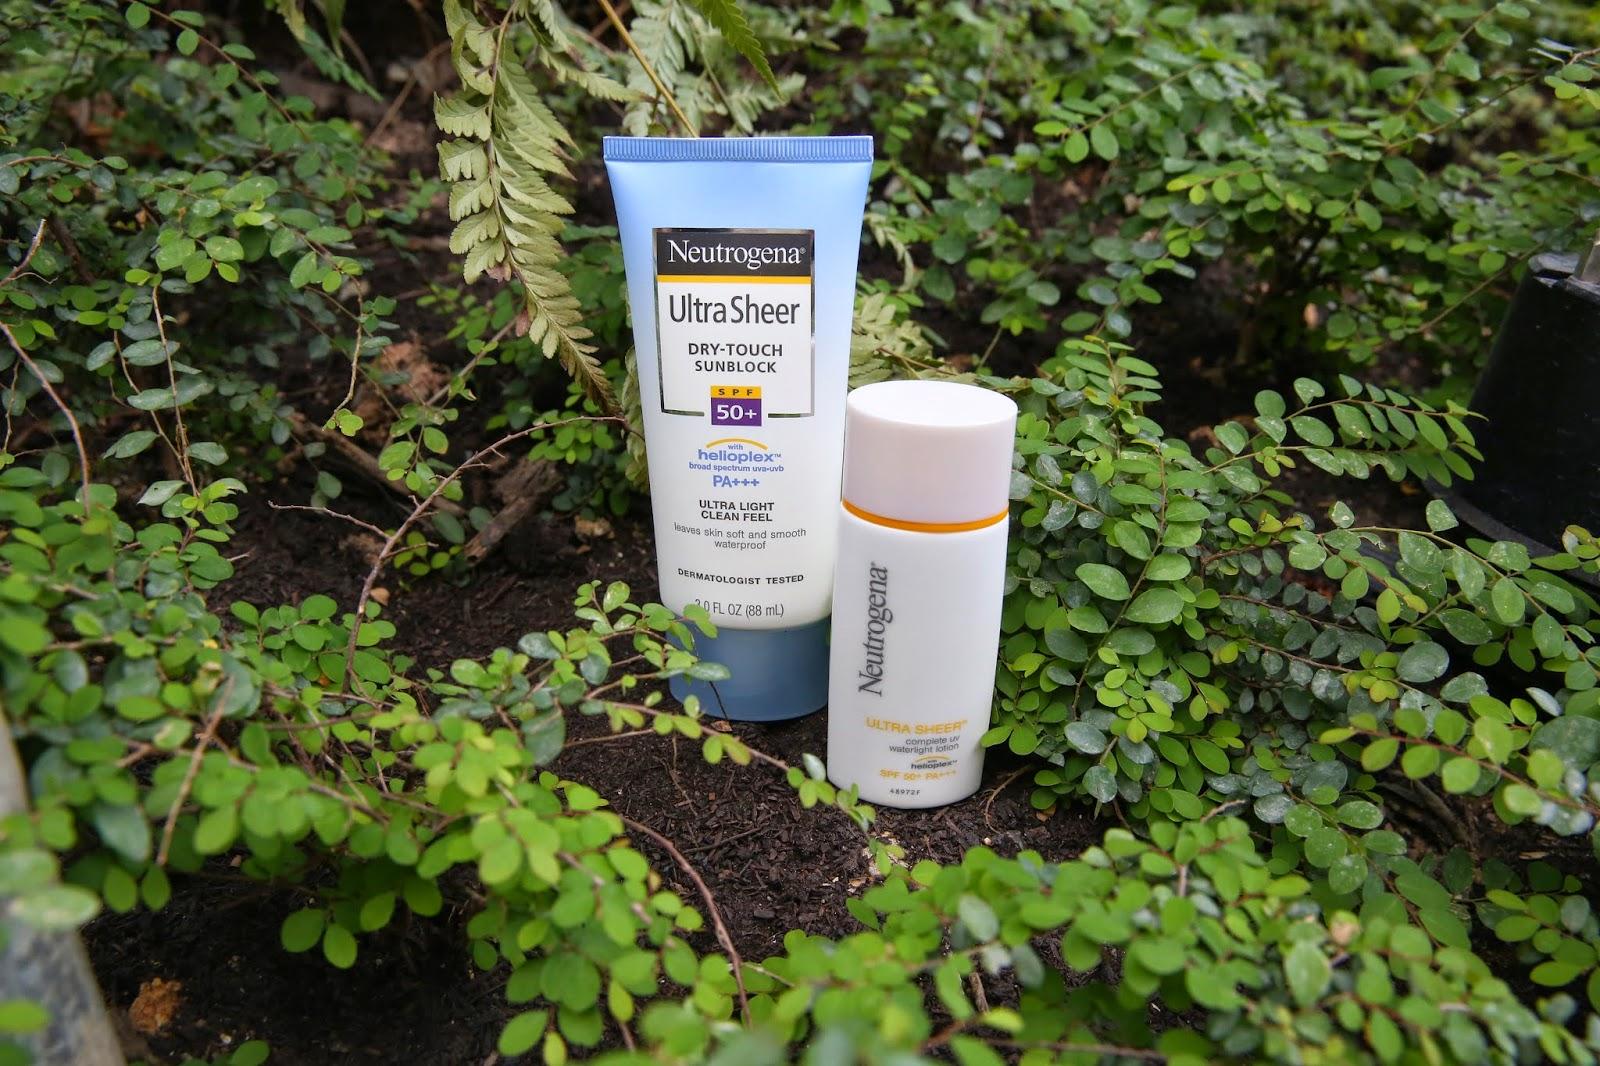 neutrogena-ultra-sheer-sunblock-deponline